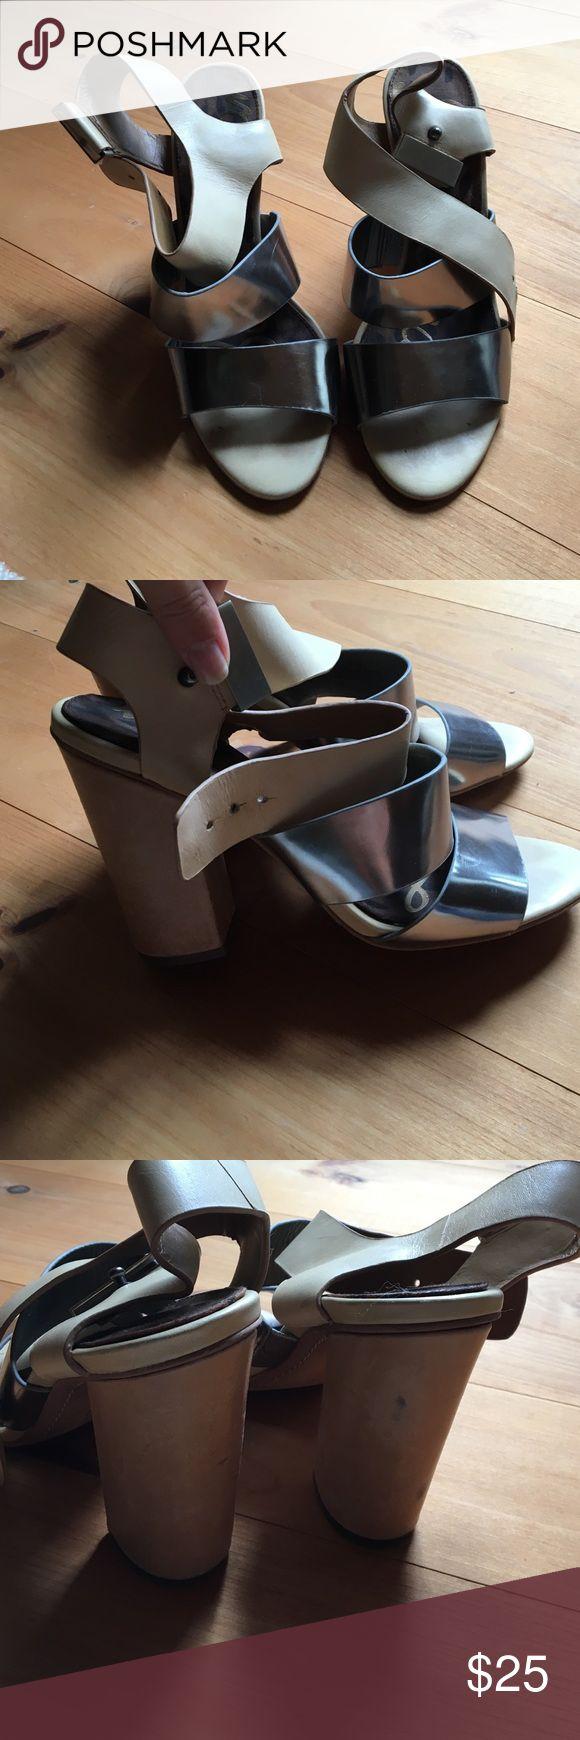 Sam Edelman heels Leather high heel sandals Sam Edelman Shoes Heels